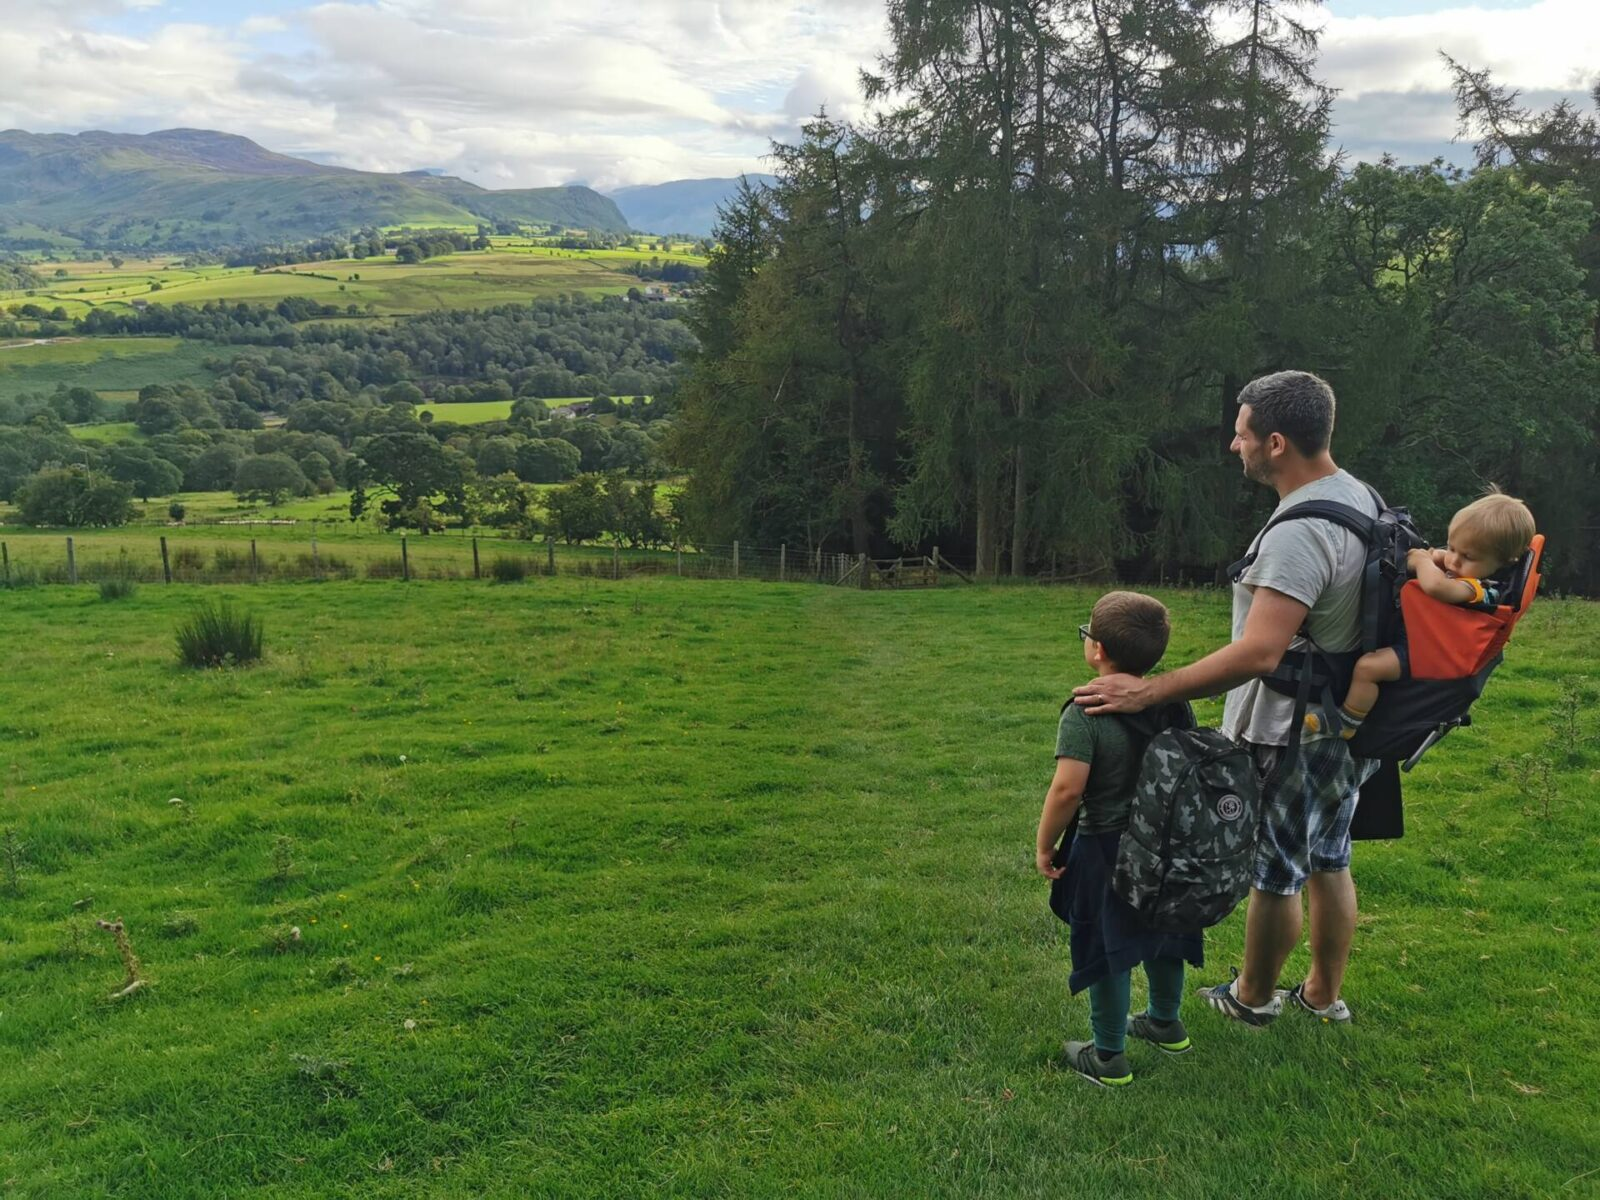 Safe outdoor activities to enjoy this Summer